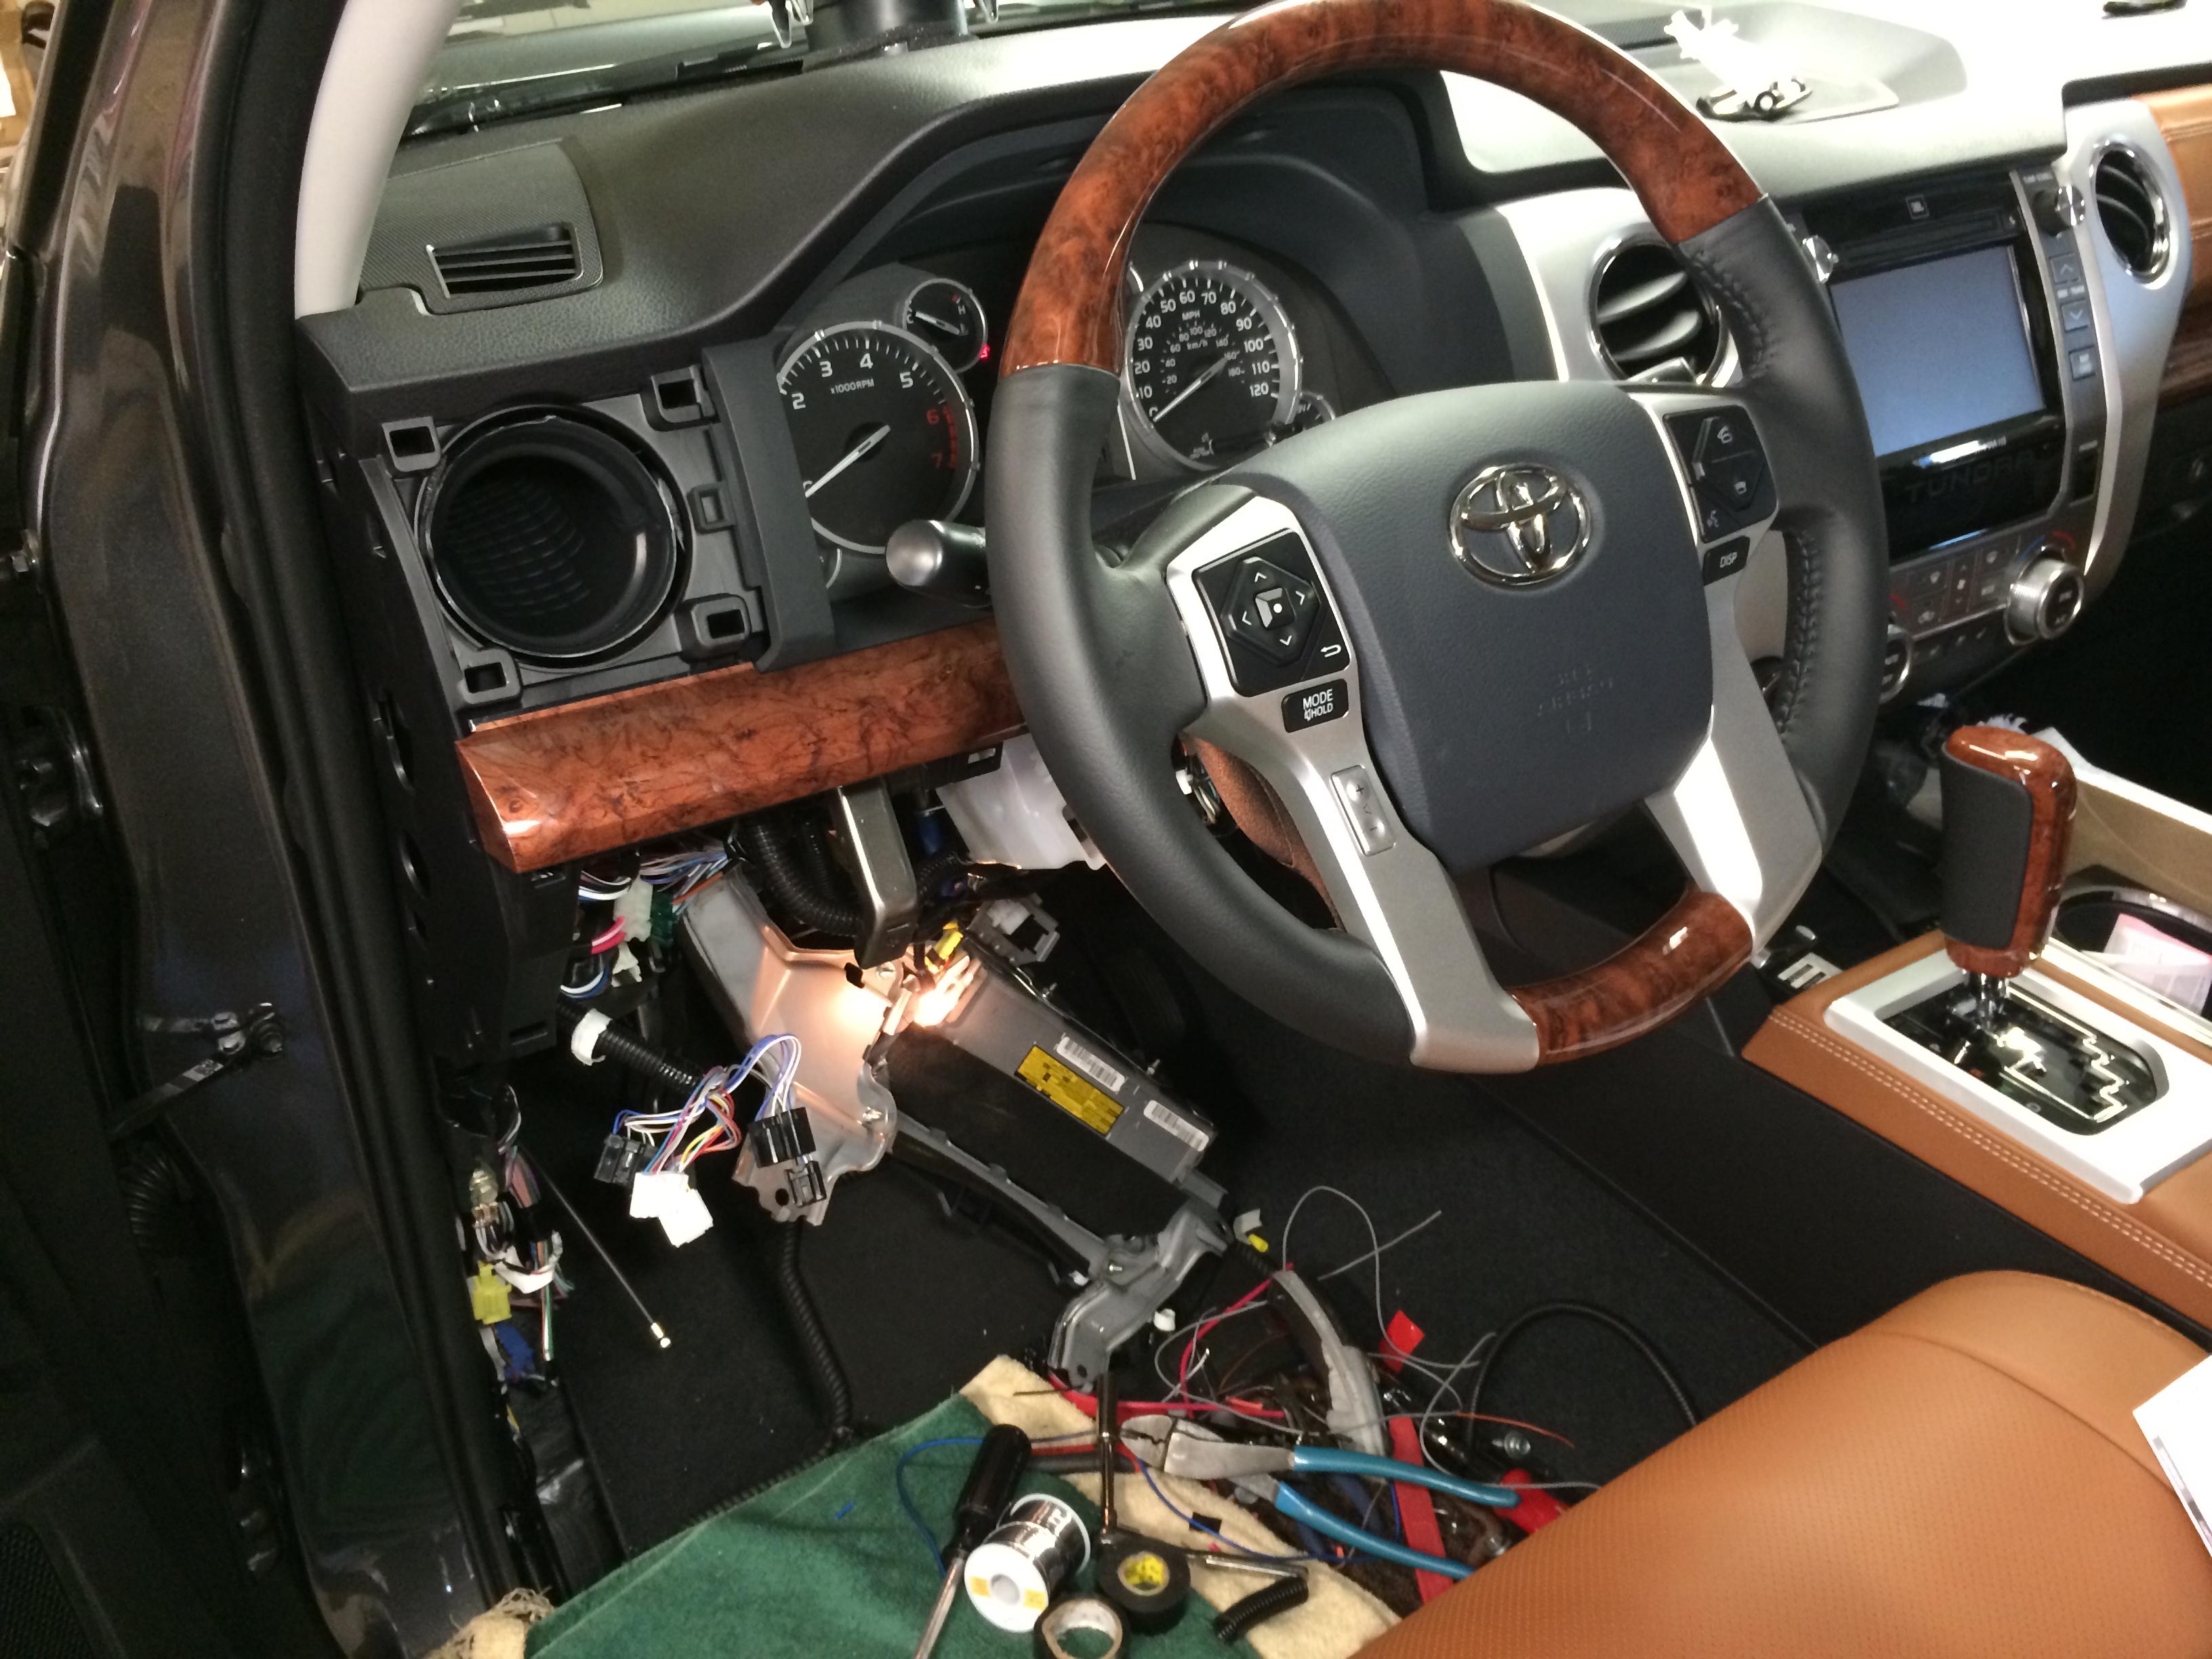 Tundra 1794 Edition >> Blossom Installations » 2015 Toyota Tundra 1794 Edition ...